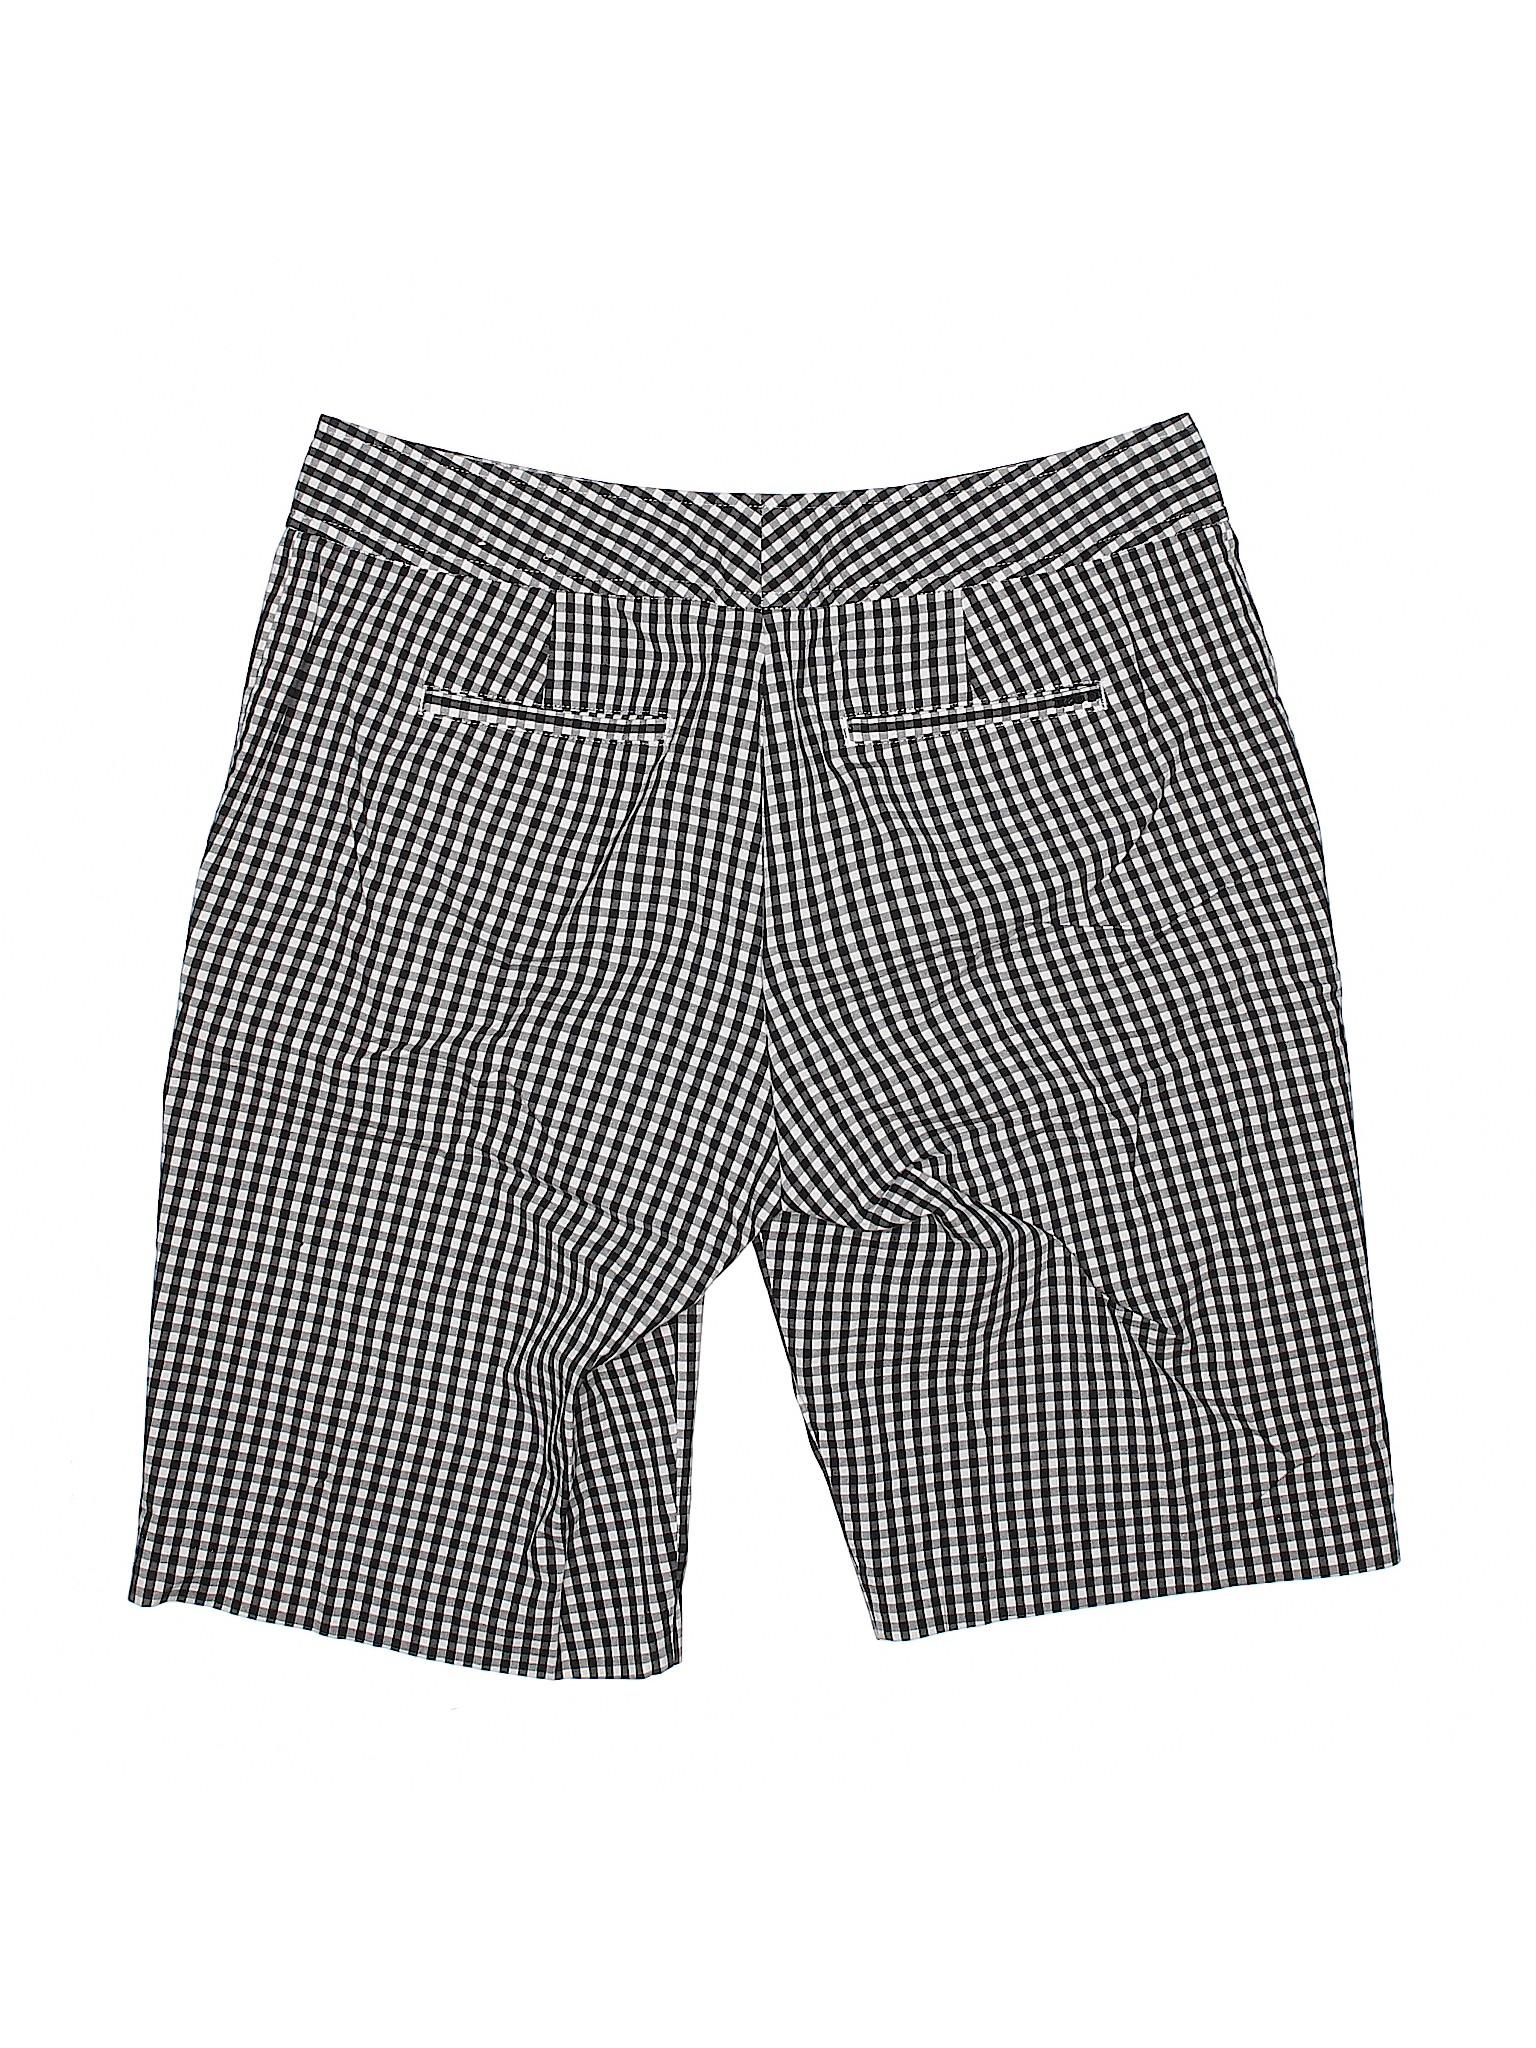 Khaki IZOD Boutique winter IZOD winter Boutique Khaki Shorts wq6n7Cz